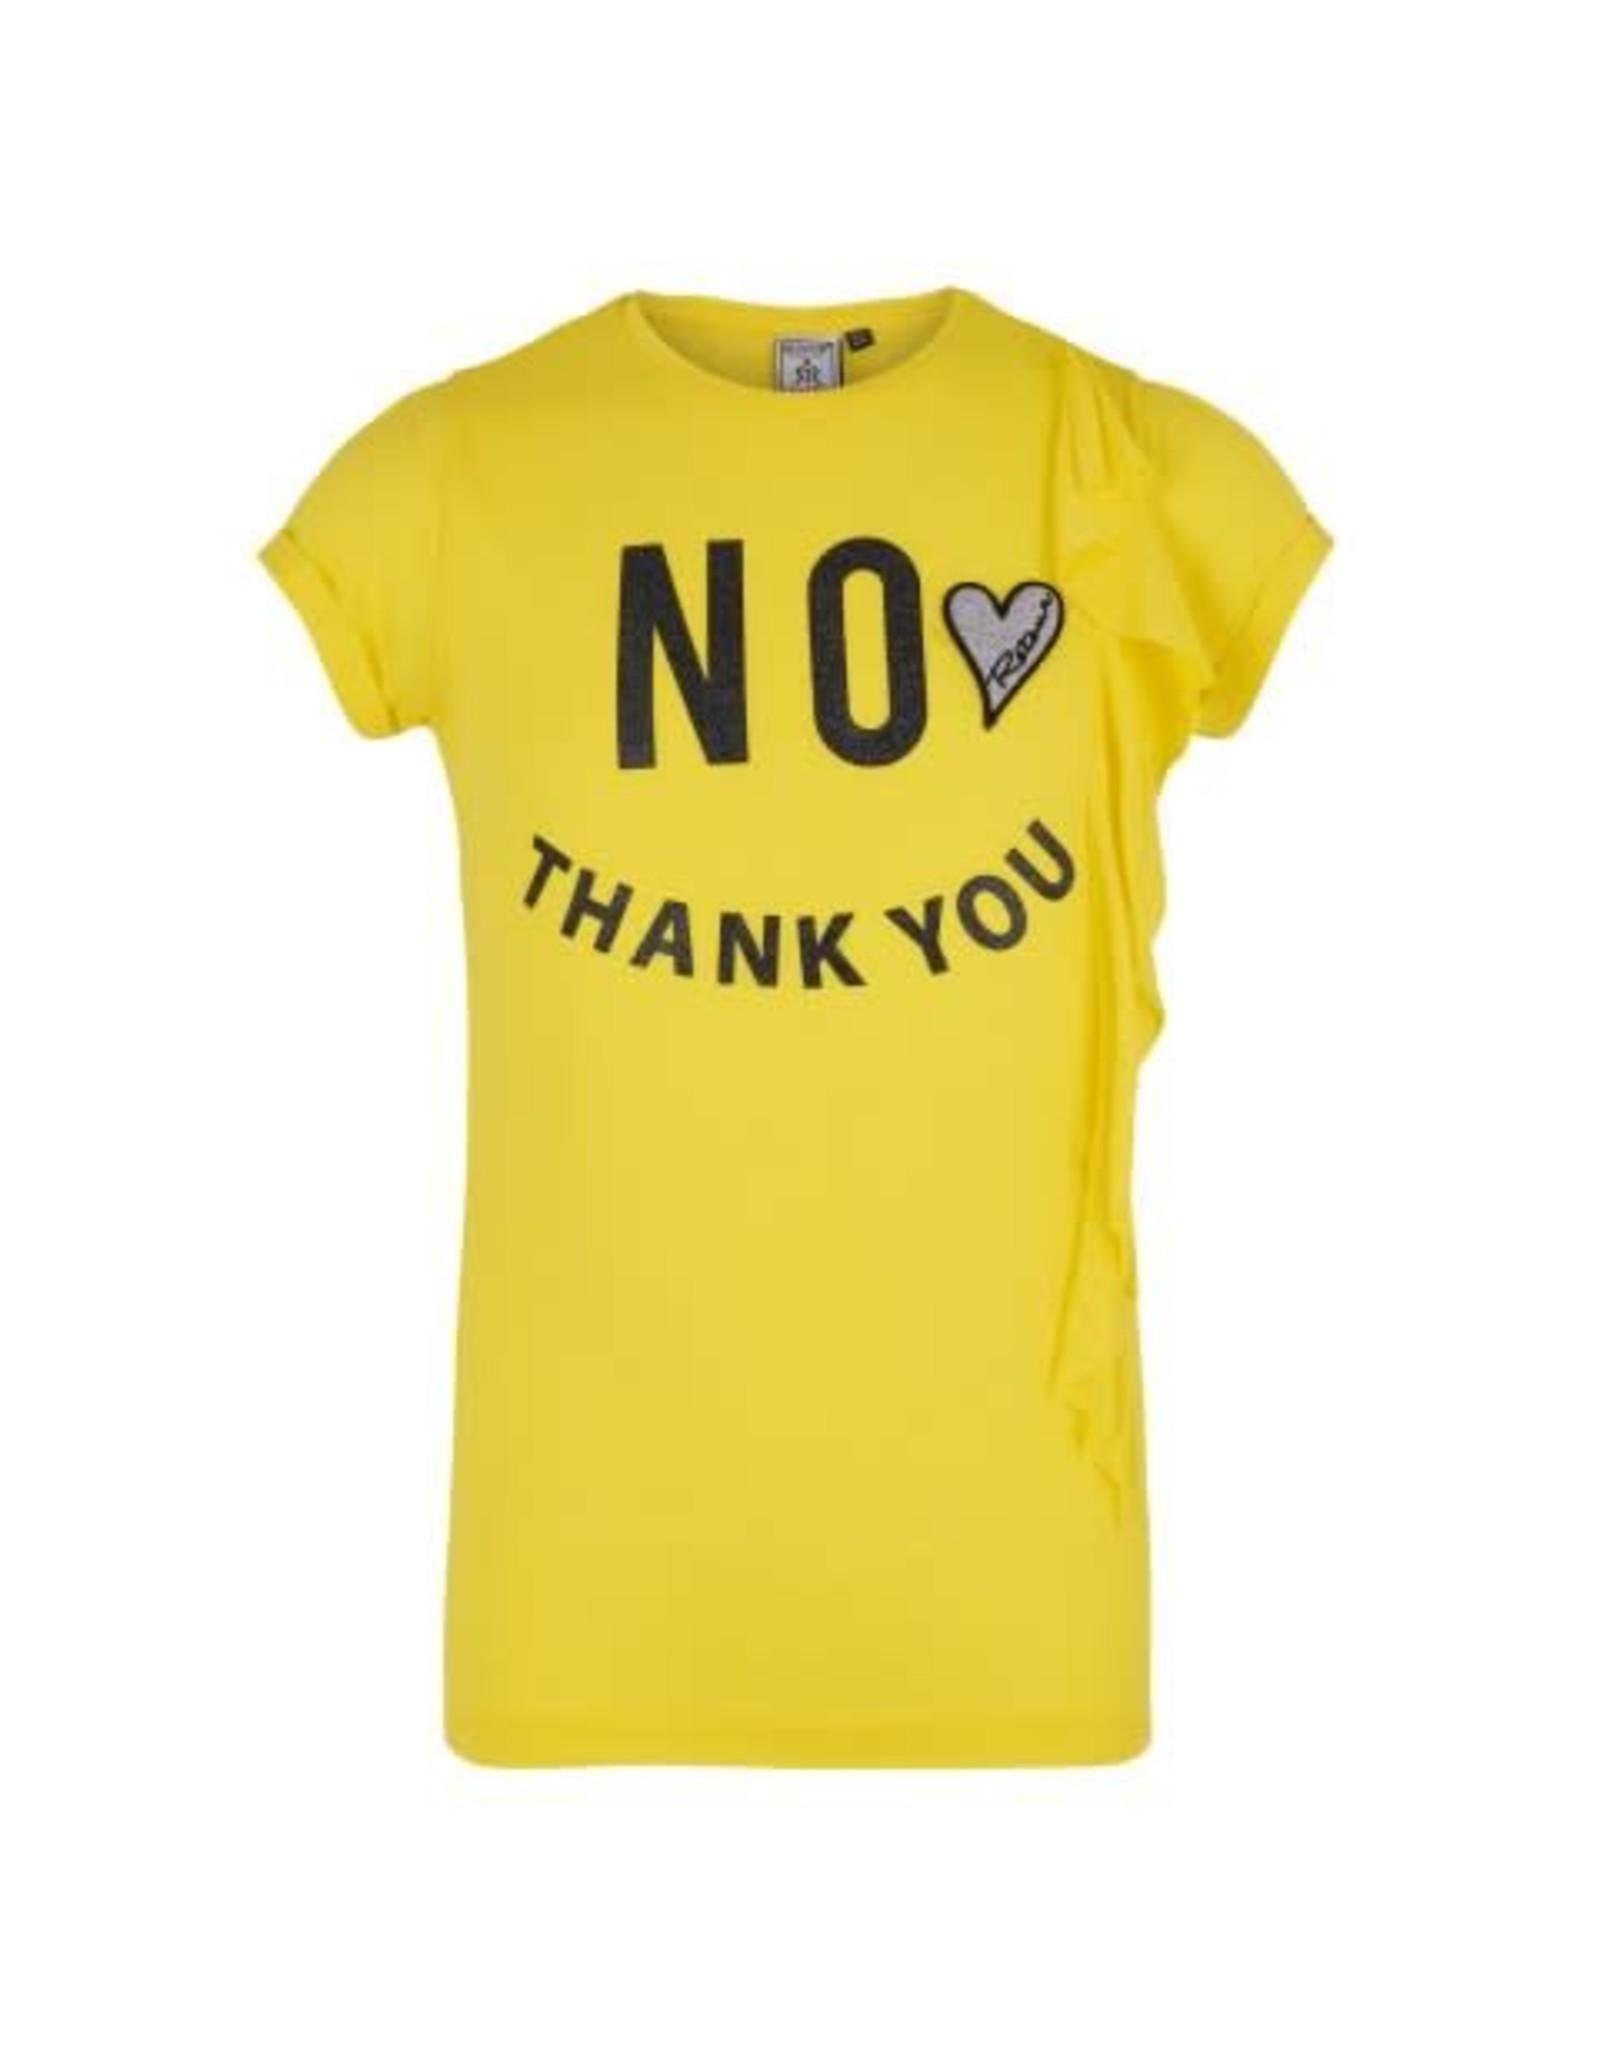 Retour JaneT-shirt 3025 yellow